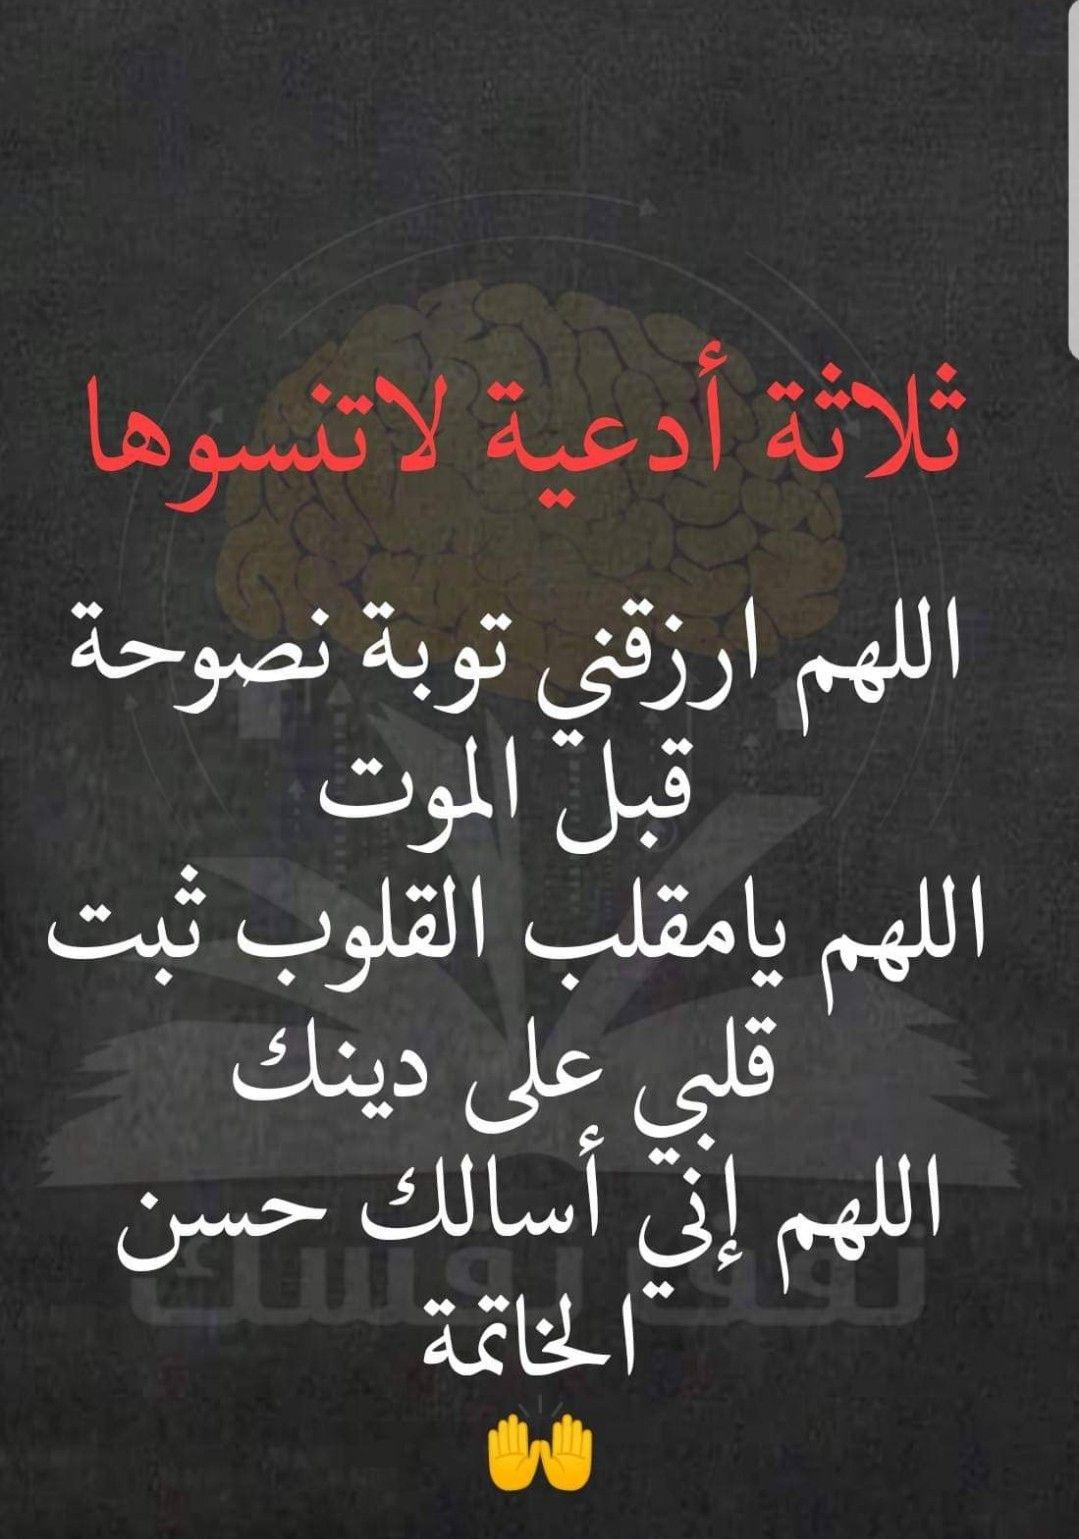 Pin By The Noble Quran On I Love Allah Quran Islam The Prophet Miracles Hadith Heaven Prophets Faith Prayer Dua حكم وعبر احاديث الله اسلام قرآن دعاء Islamic Quotes Beautiful Arabic Words